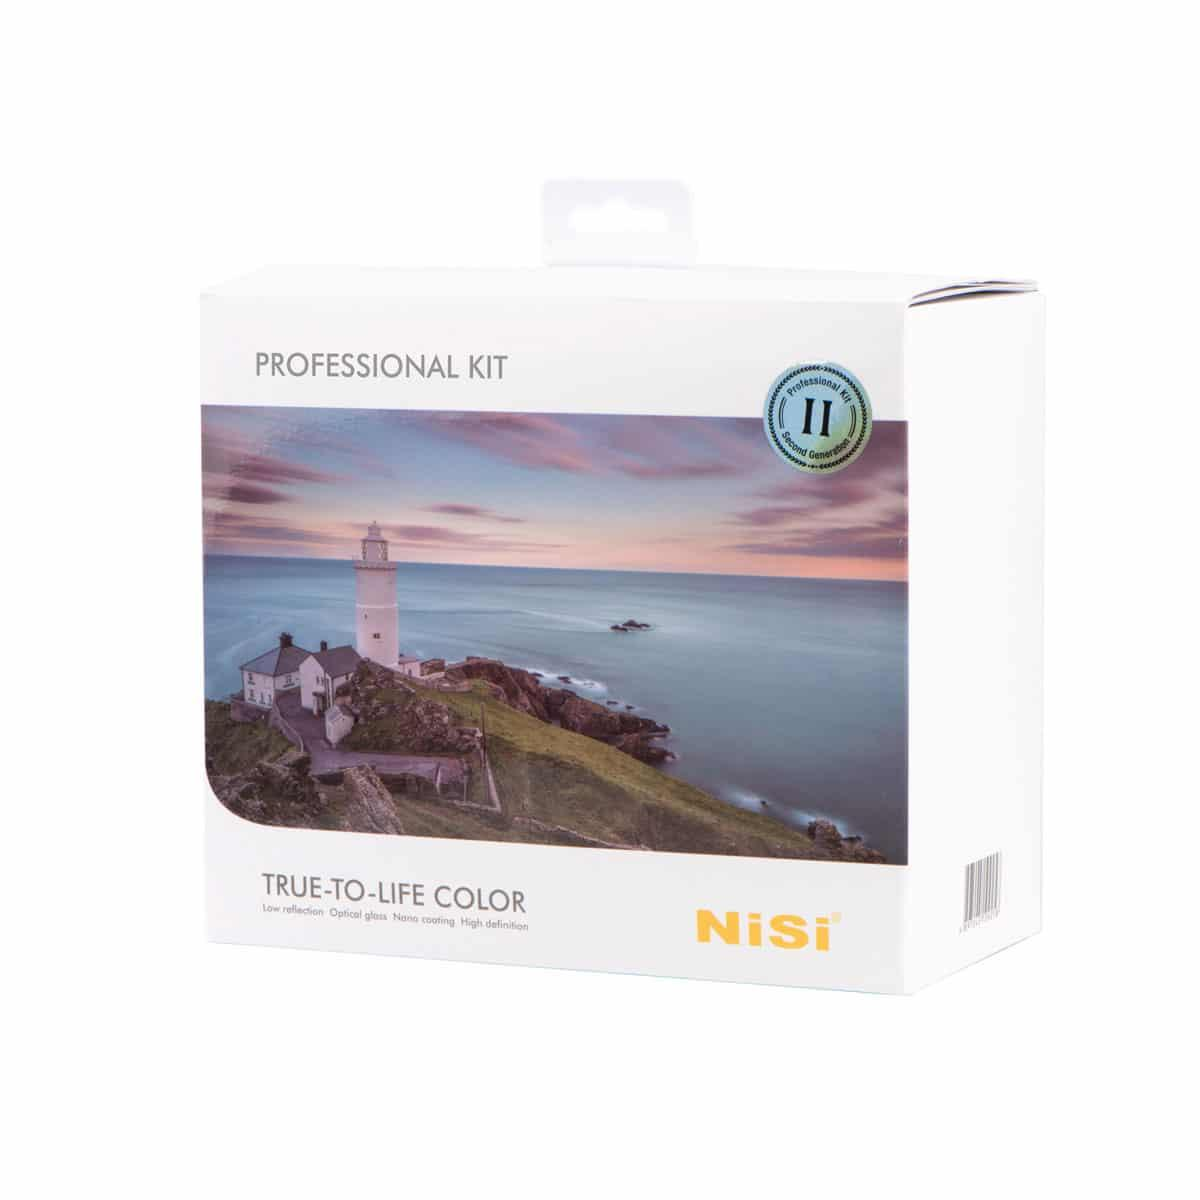 NiSi Filters 100mm Professional II